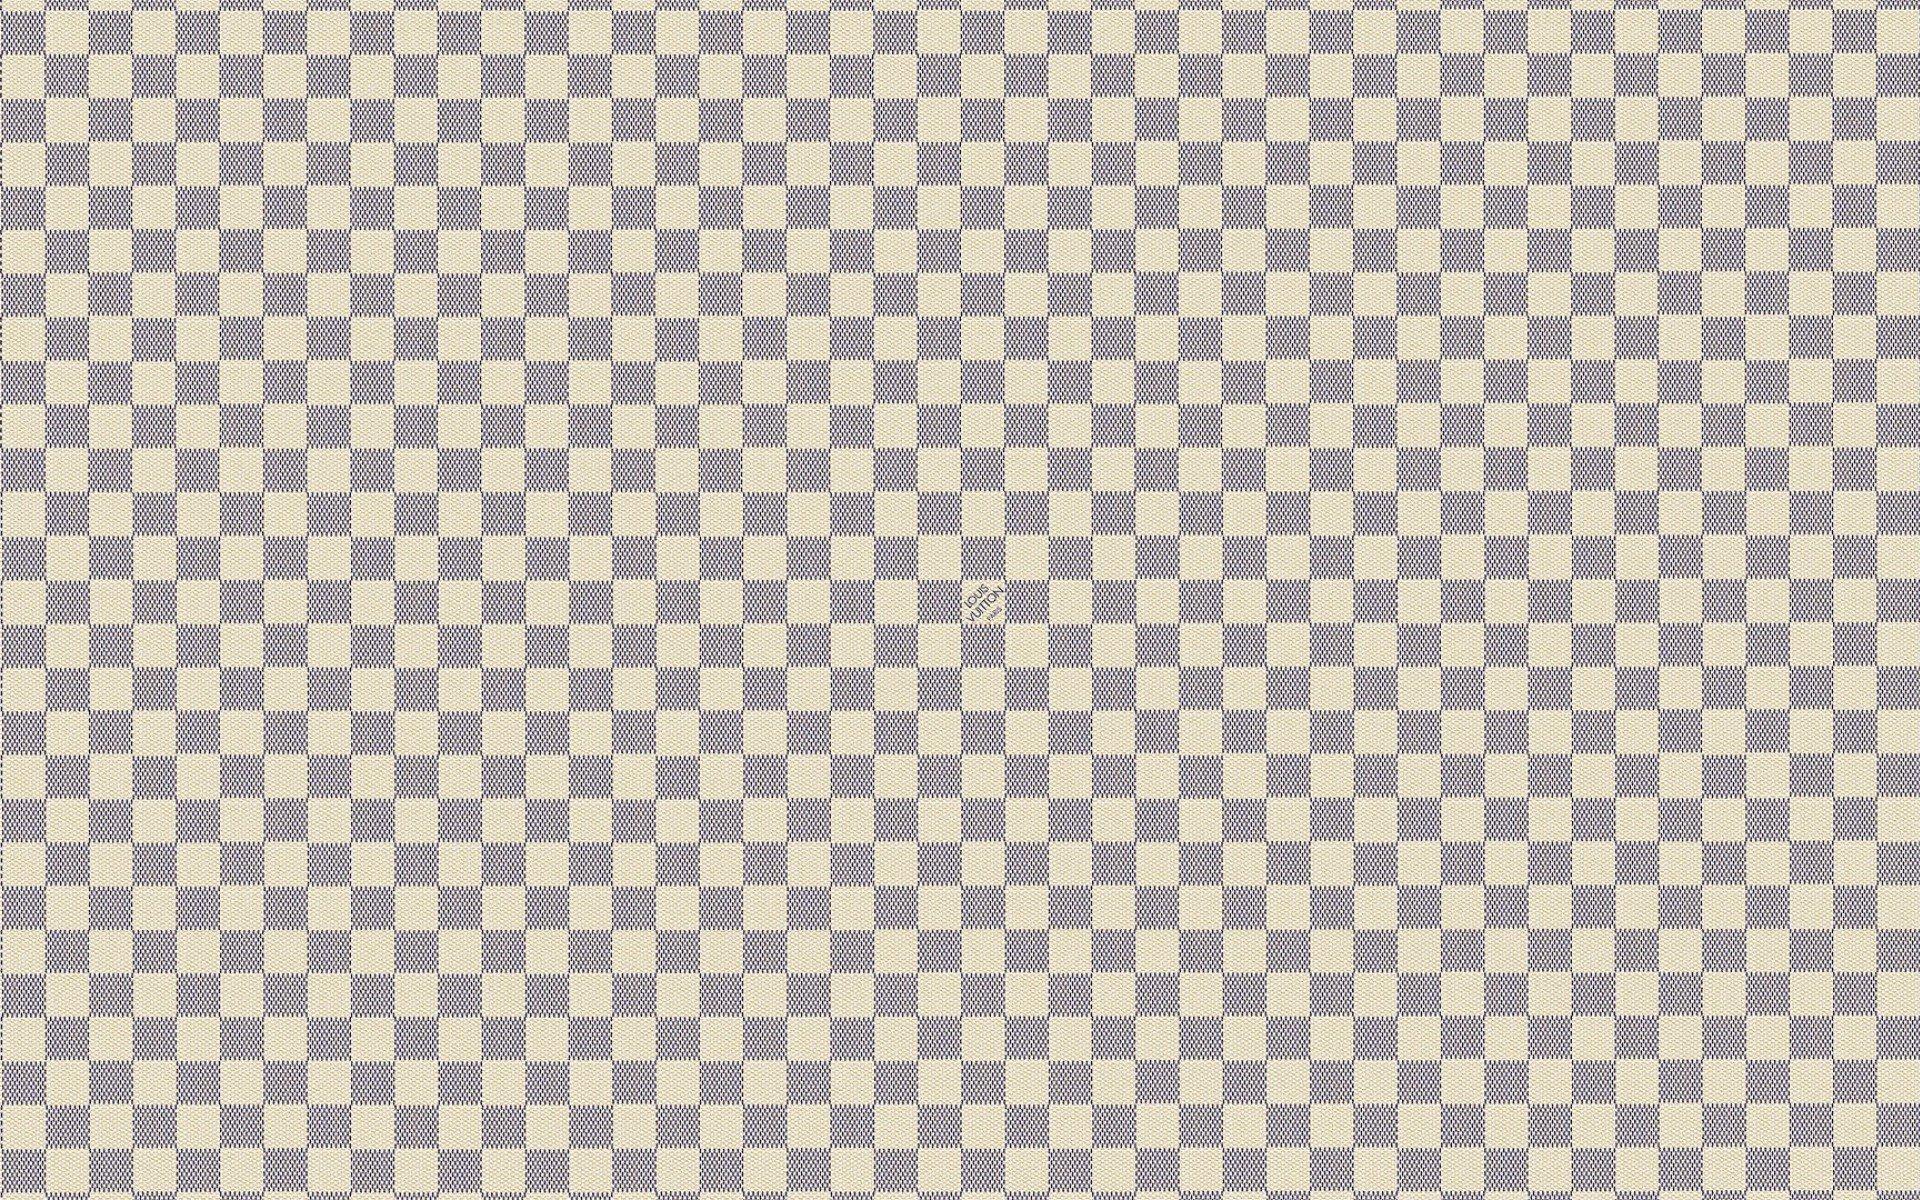 Louis Vuitton Wallpaper For Iphone Louis Vuitton Wallpaper